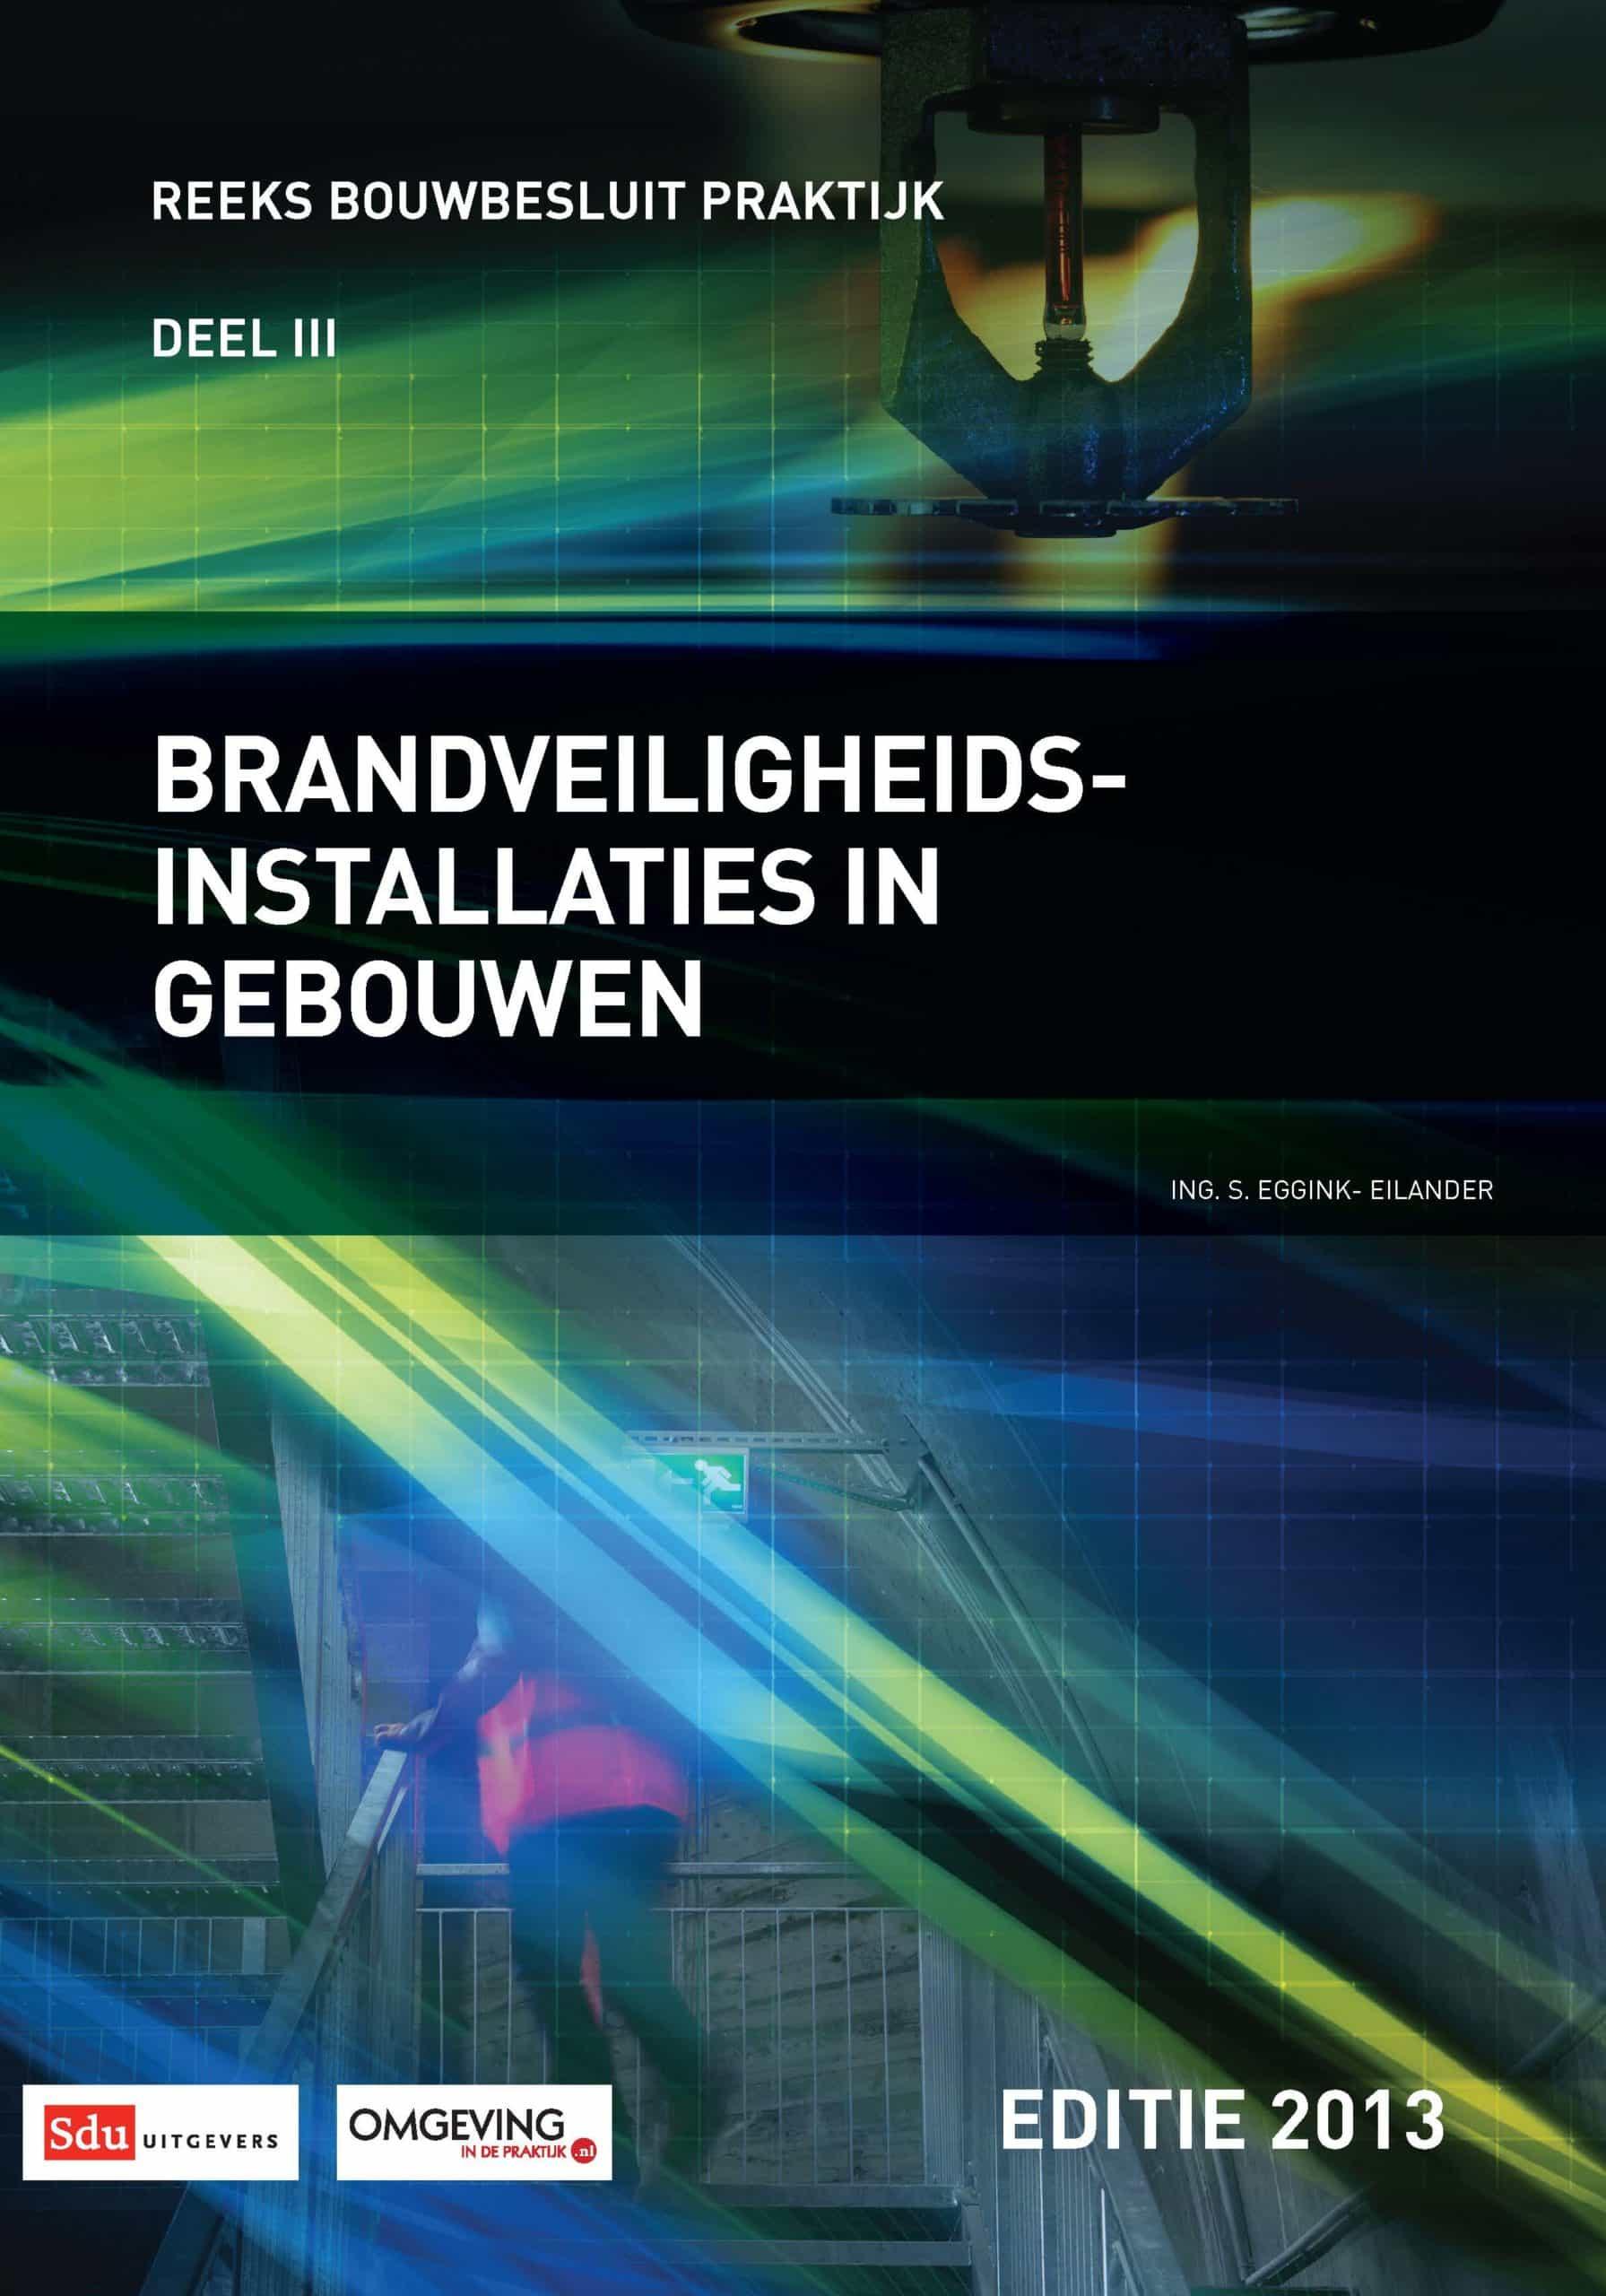 voorplat-Brandveiligheidinstallaties-in-gebouwen-B5-1-scaled